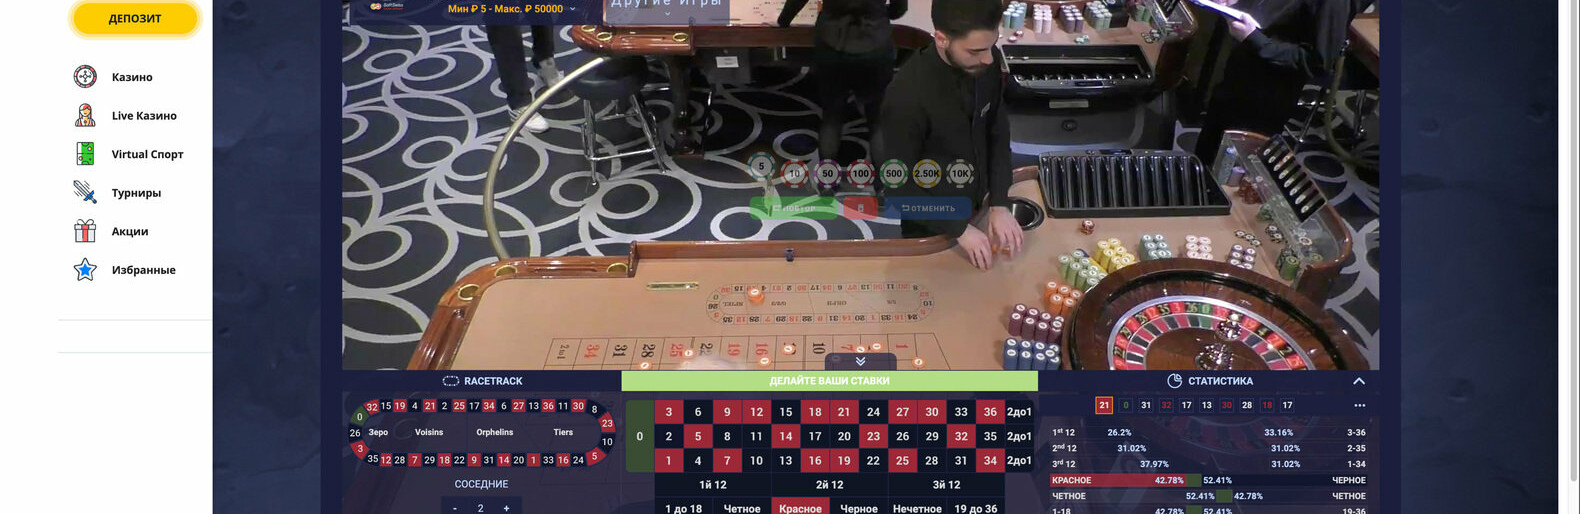 игра фишка казино зеро азарт